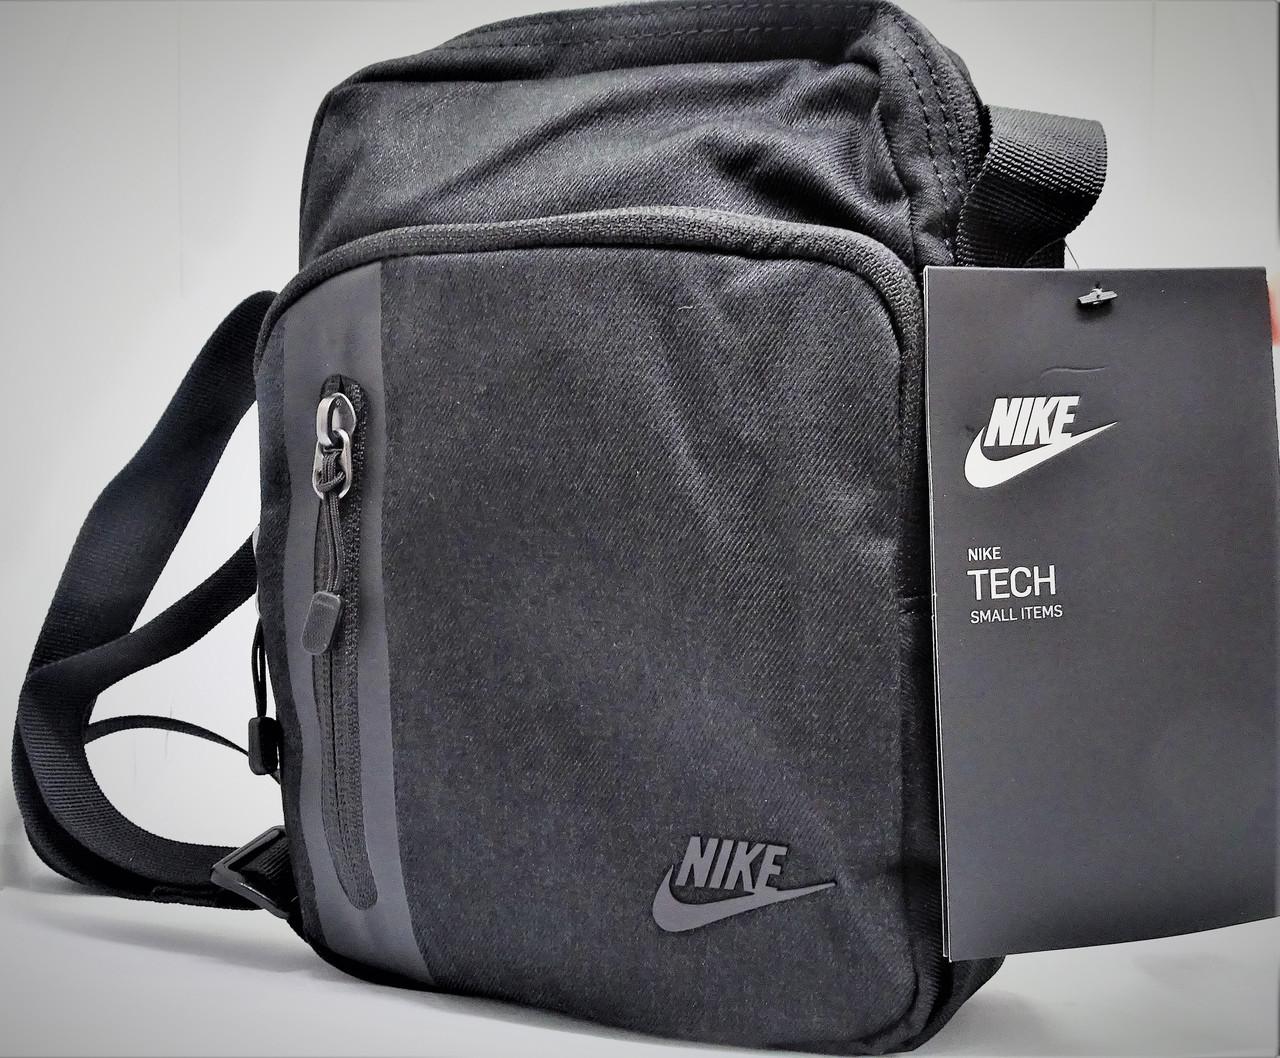 Сумка мужская через плечо Nike Core Small Items 3.0